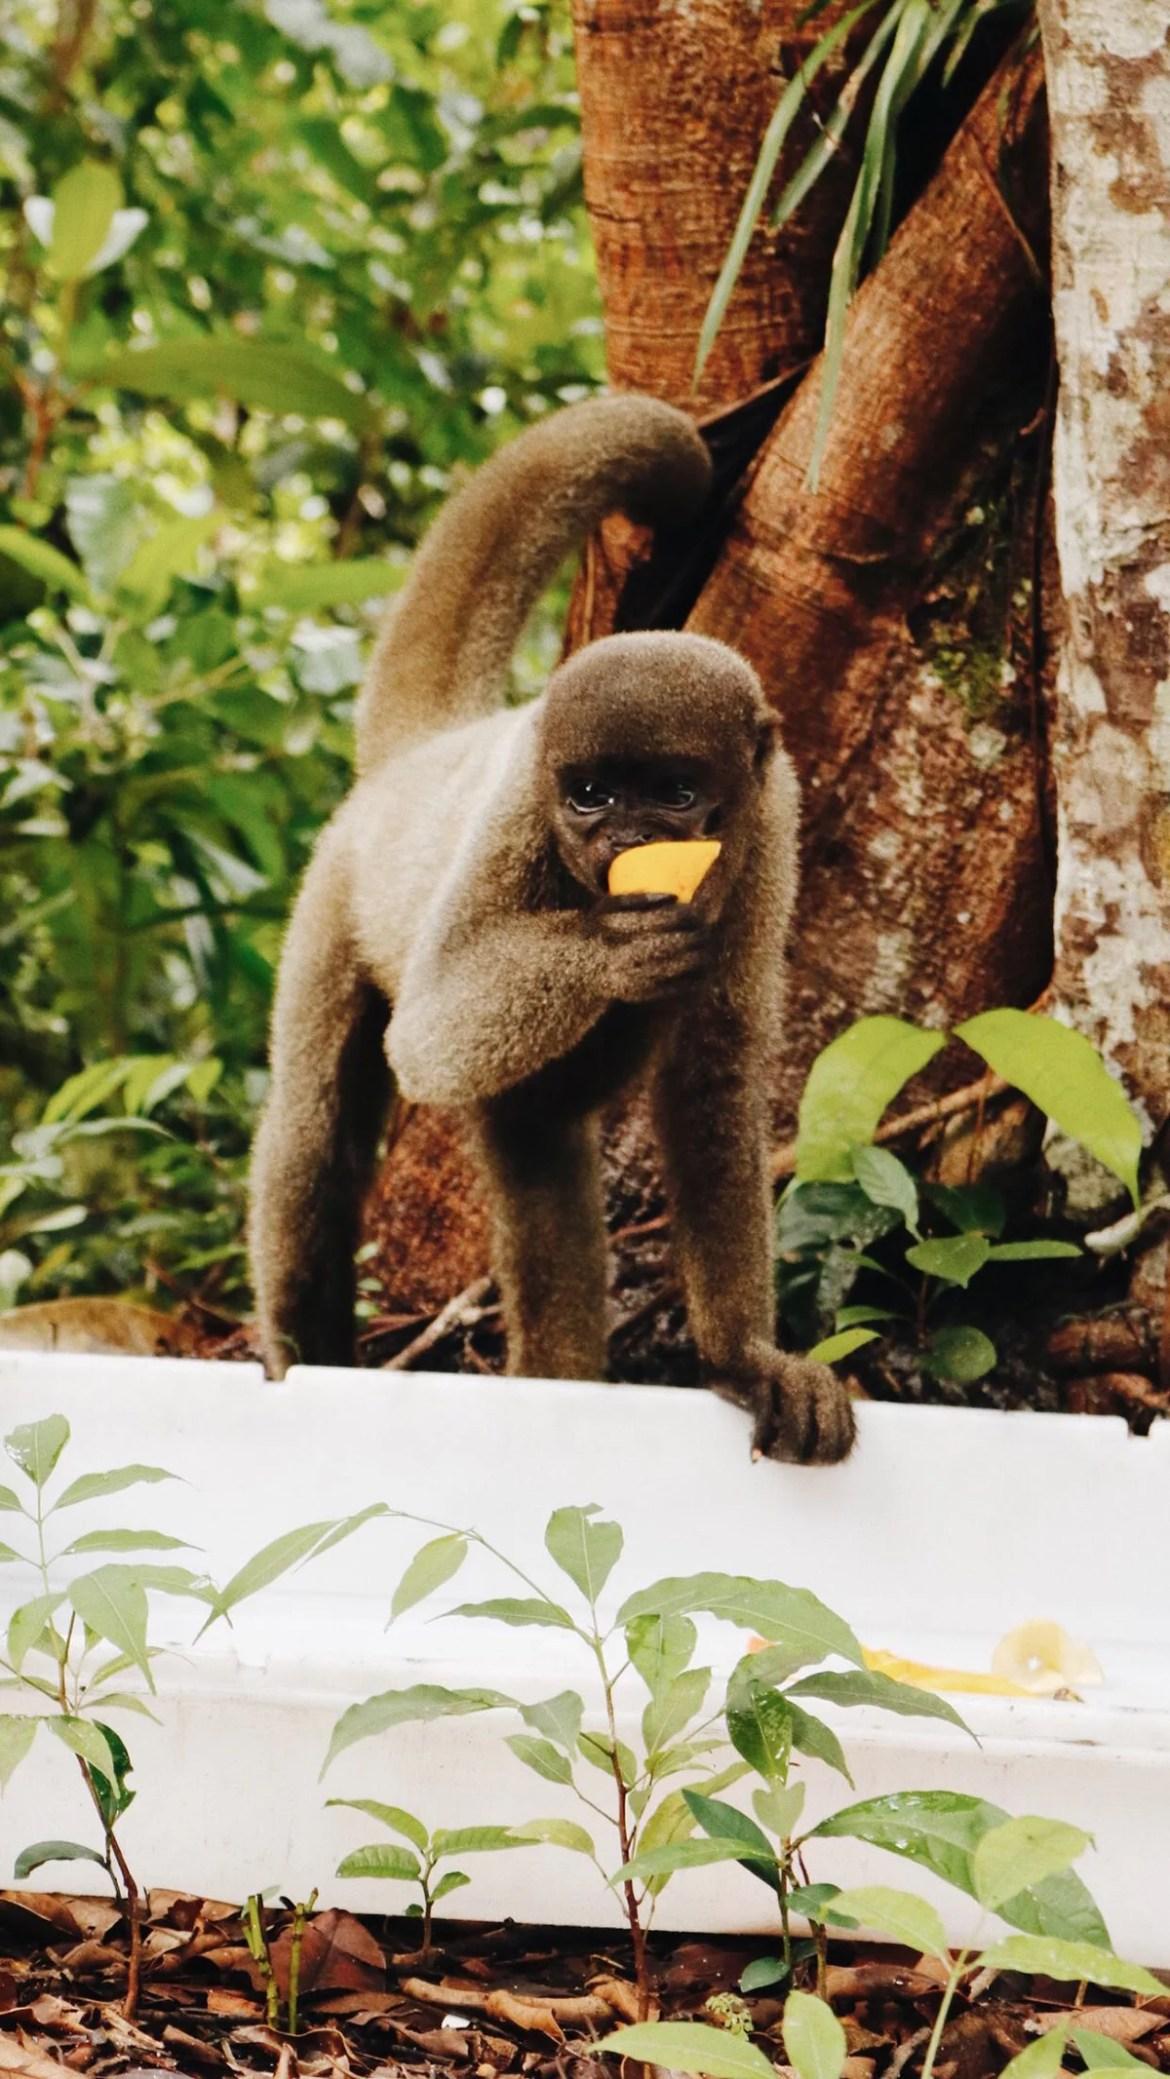 Macaca se alimentando de frutas frescas